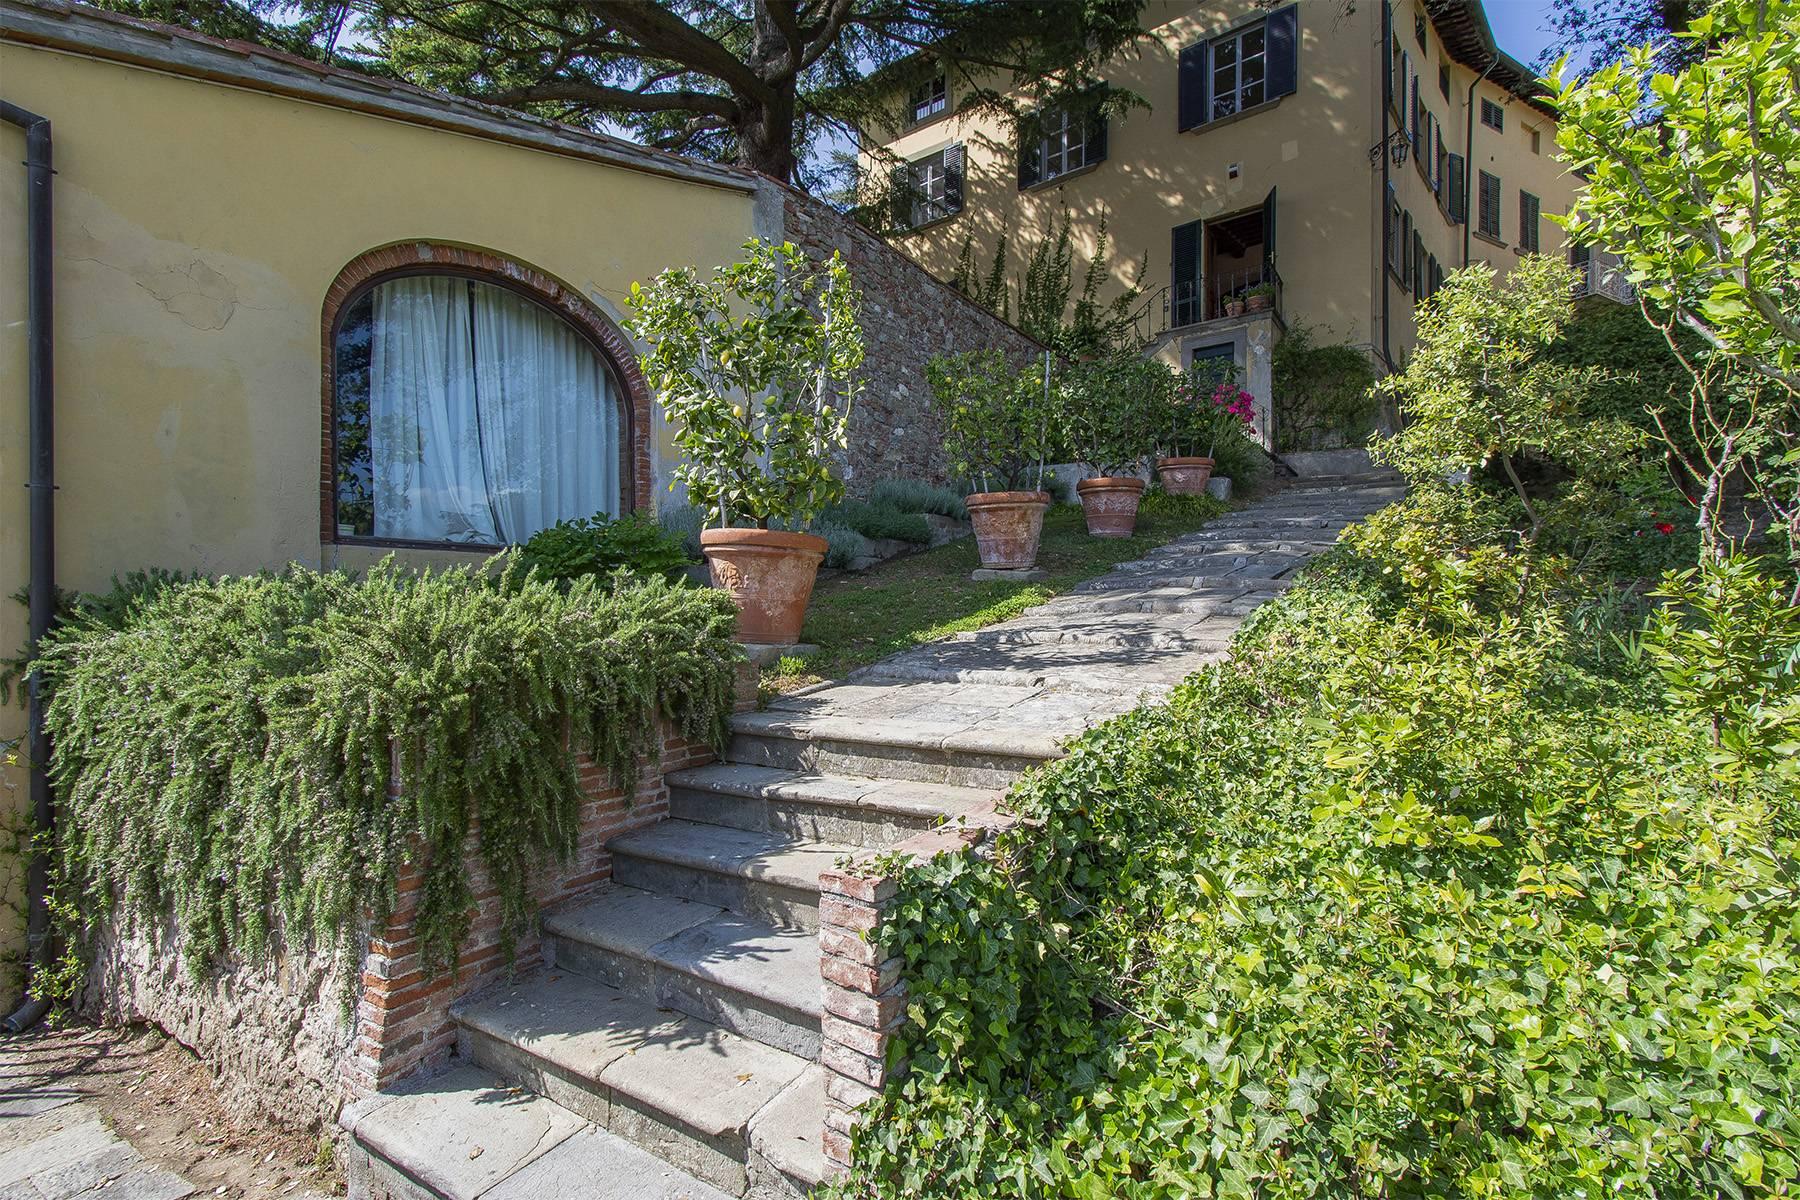 Villa in Vendita a Capannori: 5 locali, 380 mq - Foto 2